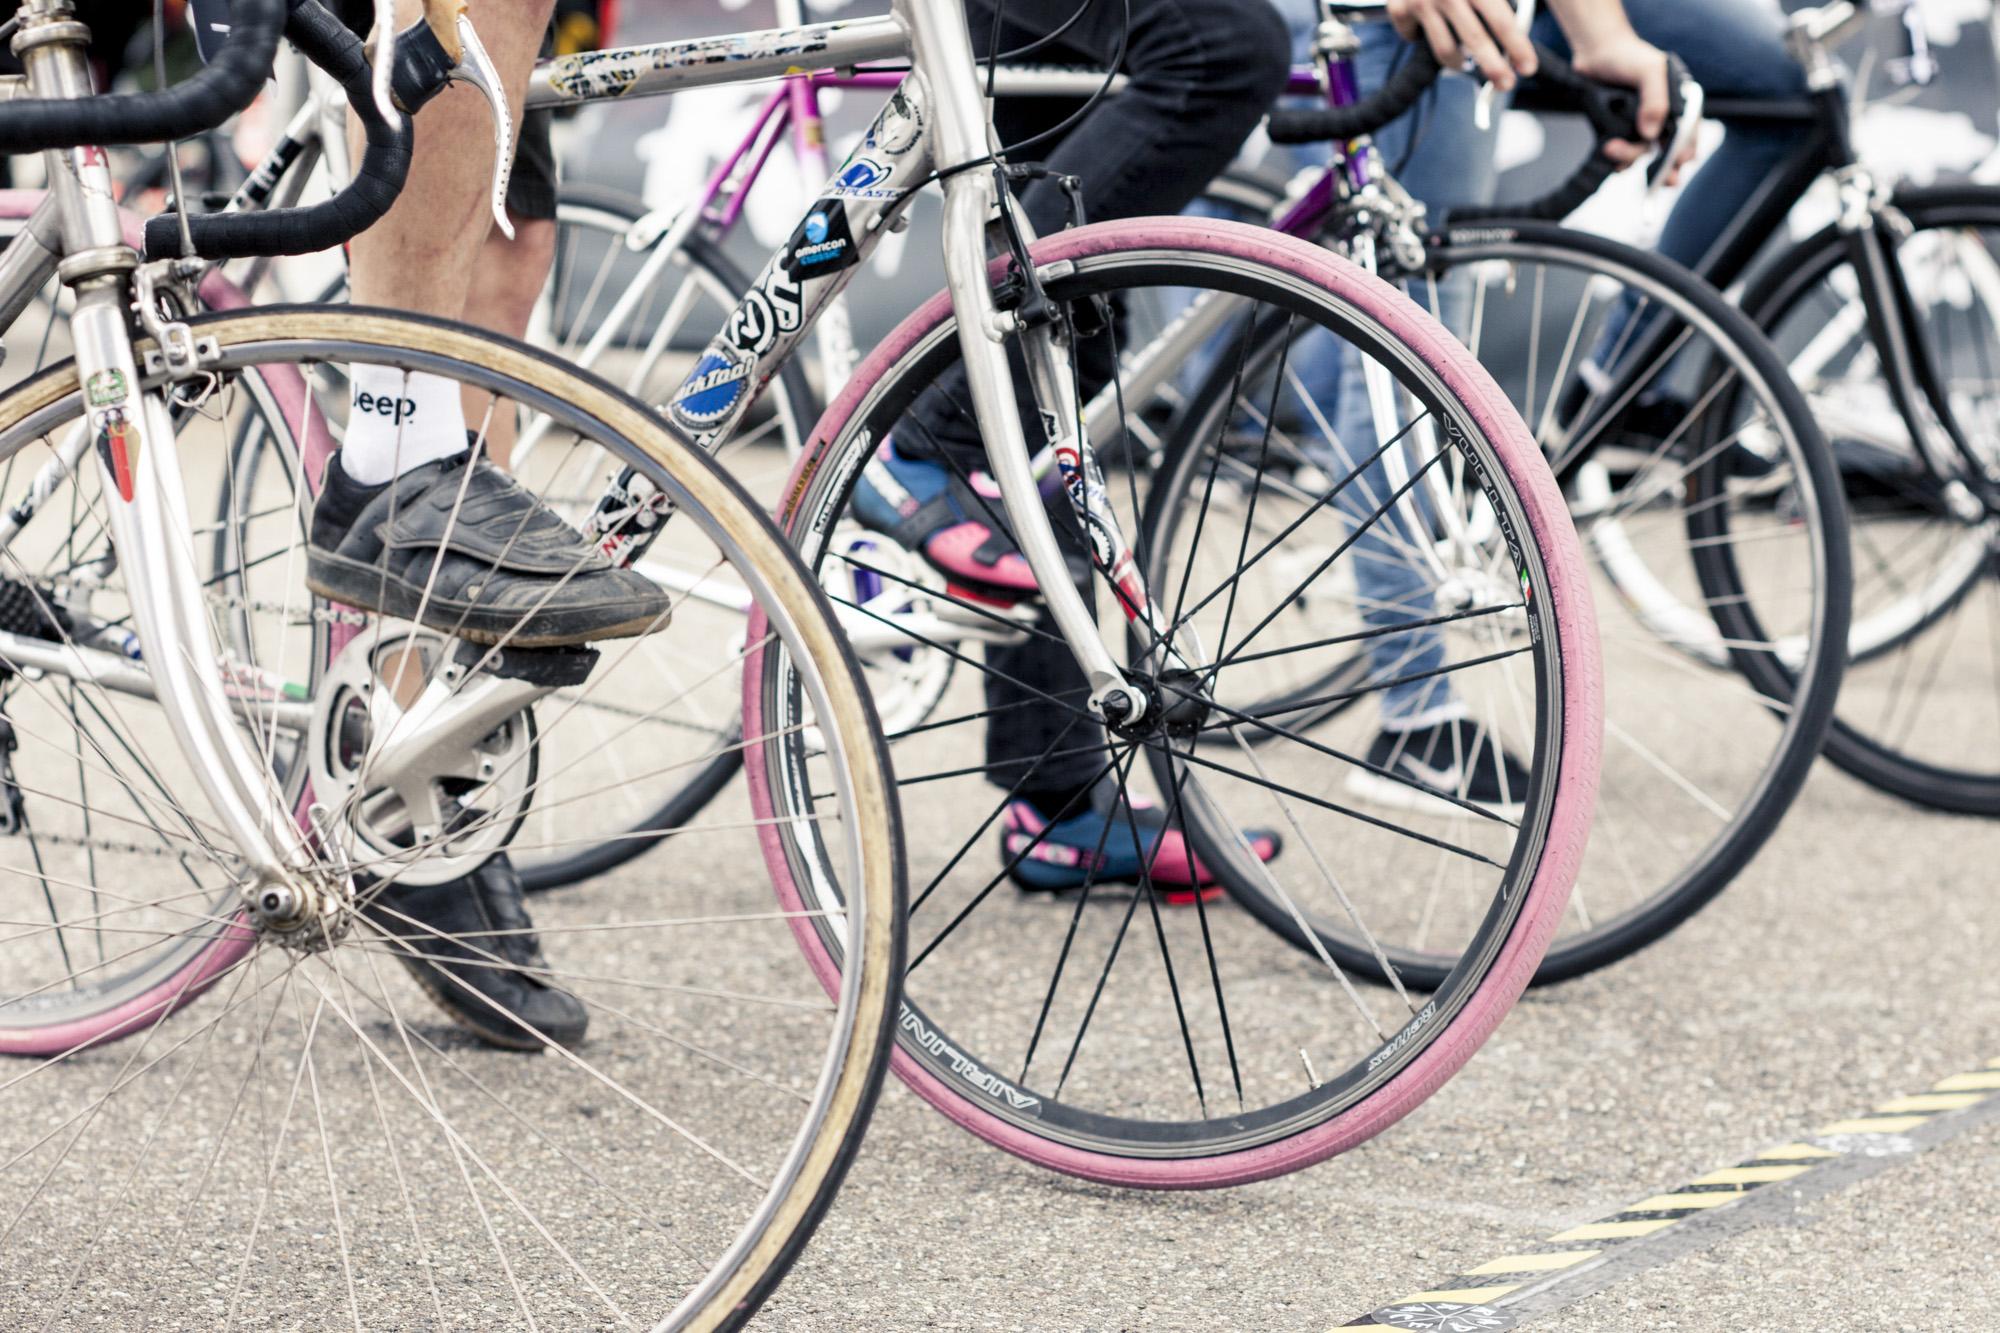 RAD RACE Street Hunt Karlsruhe // Pic by Daniel Fuchs